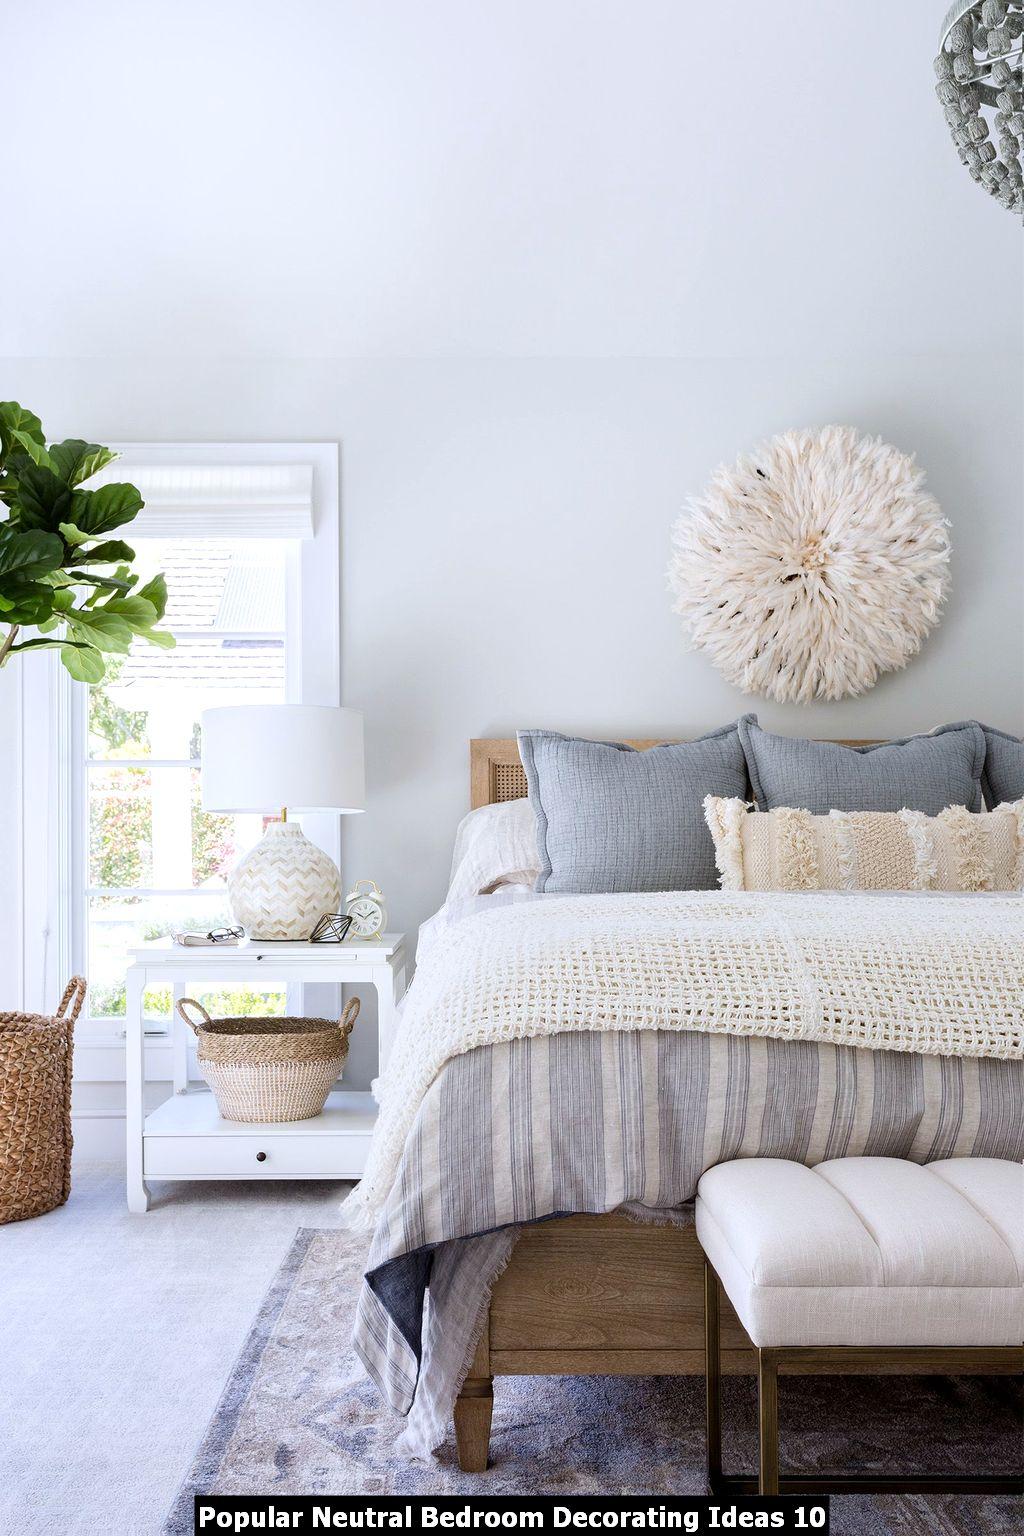 Popular Neutral Bedroom Decorating Ideas 10